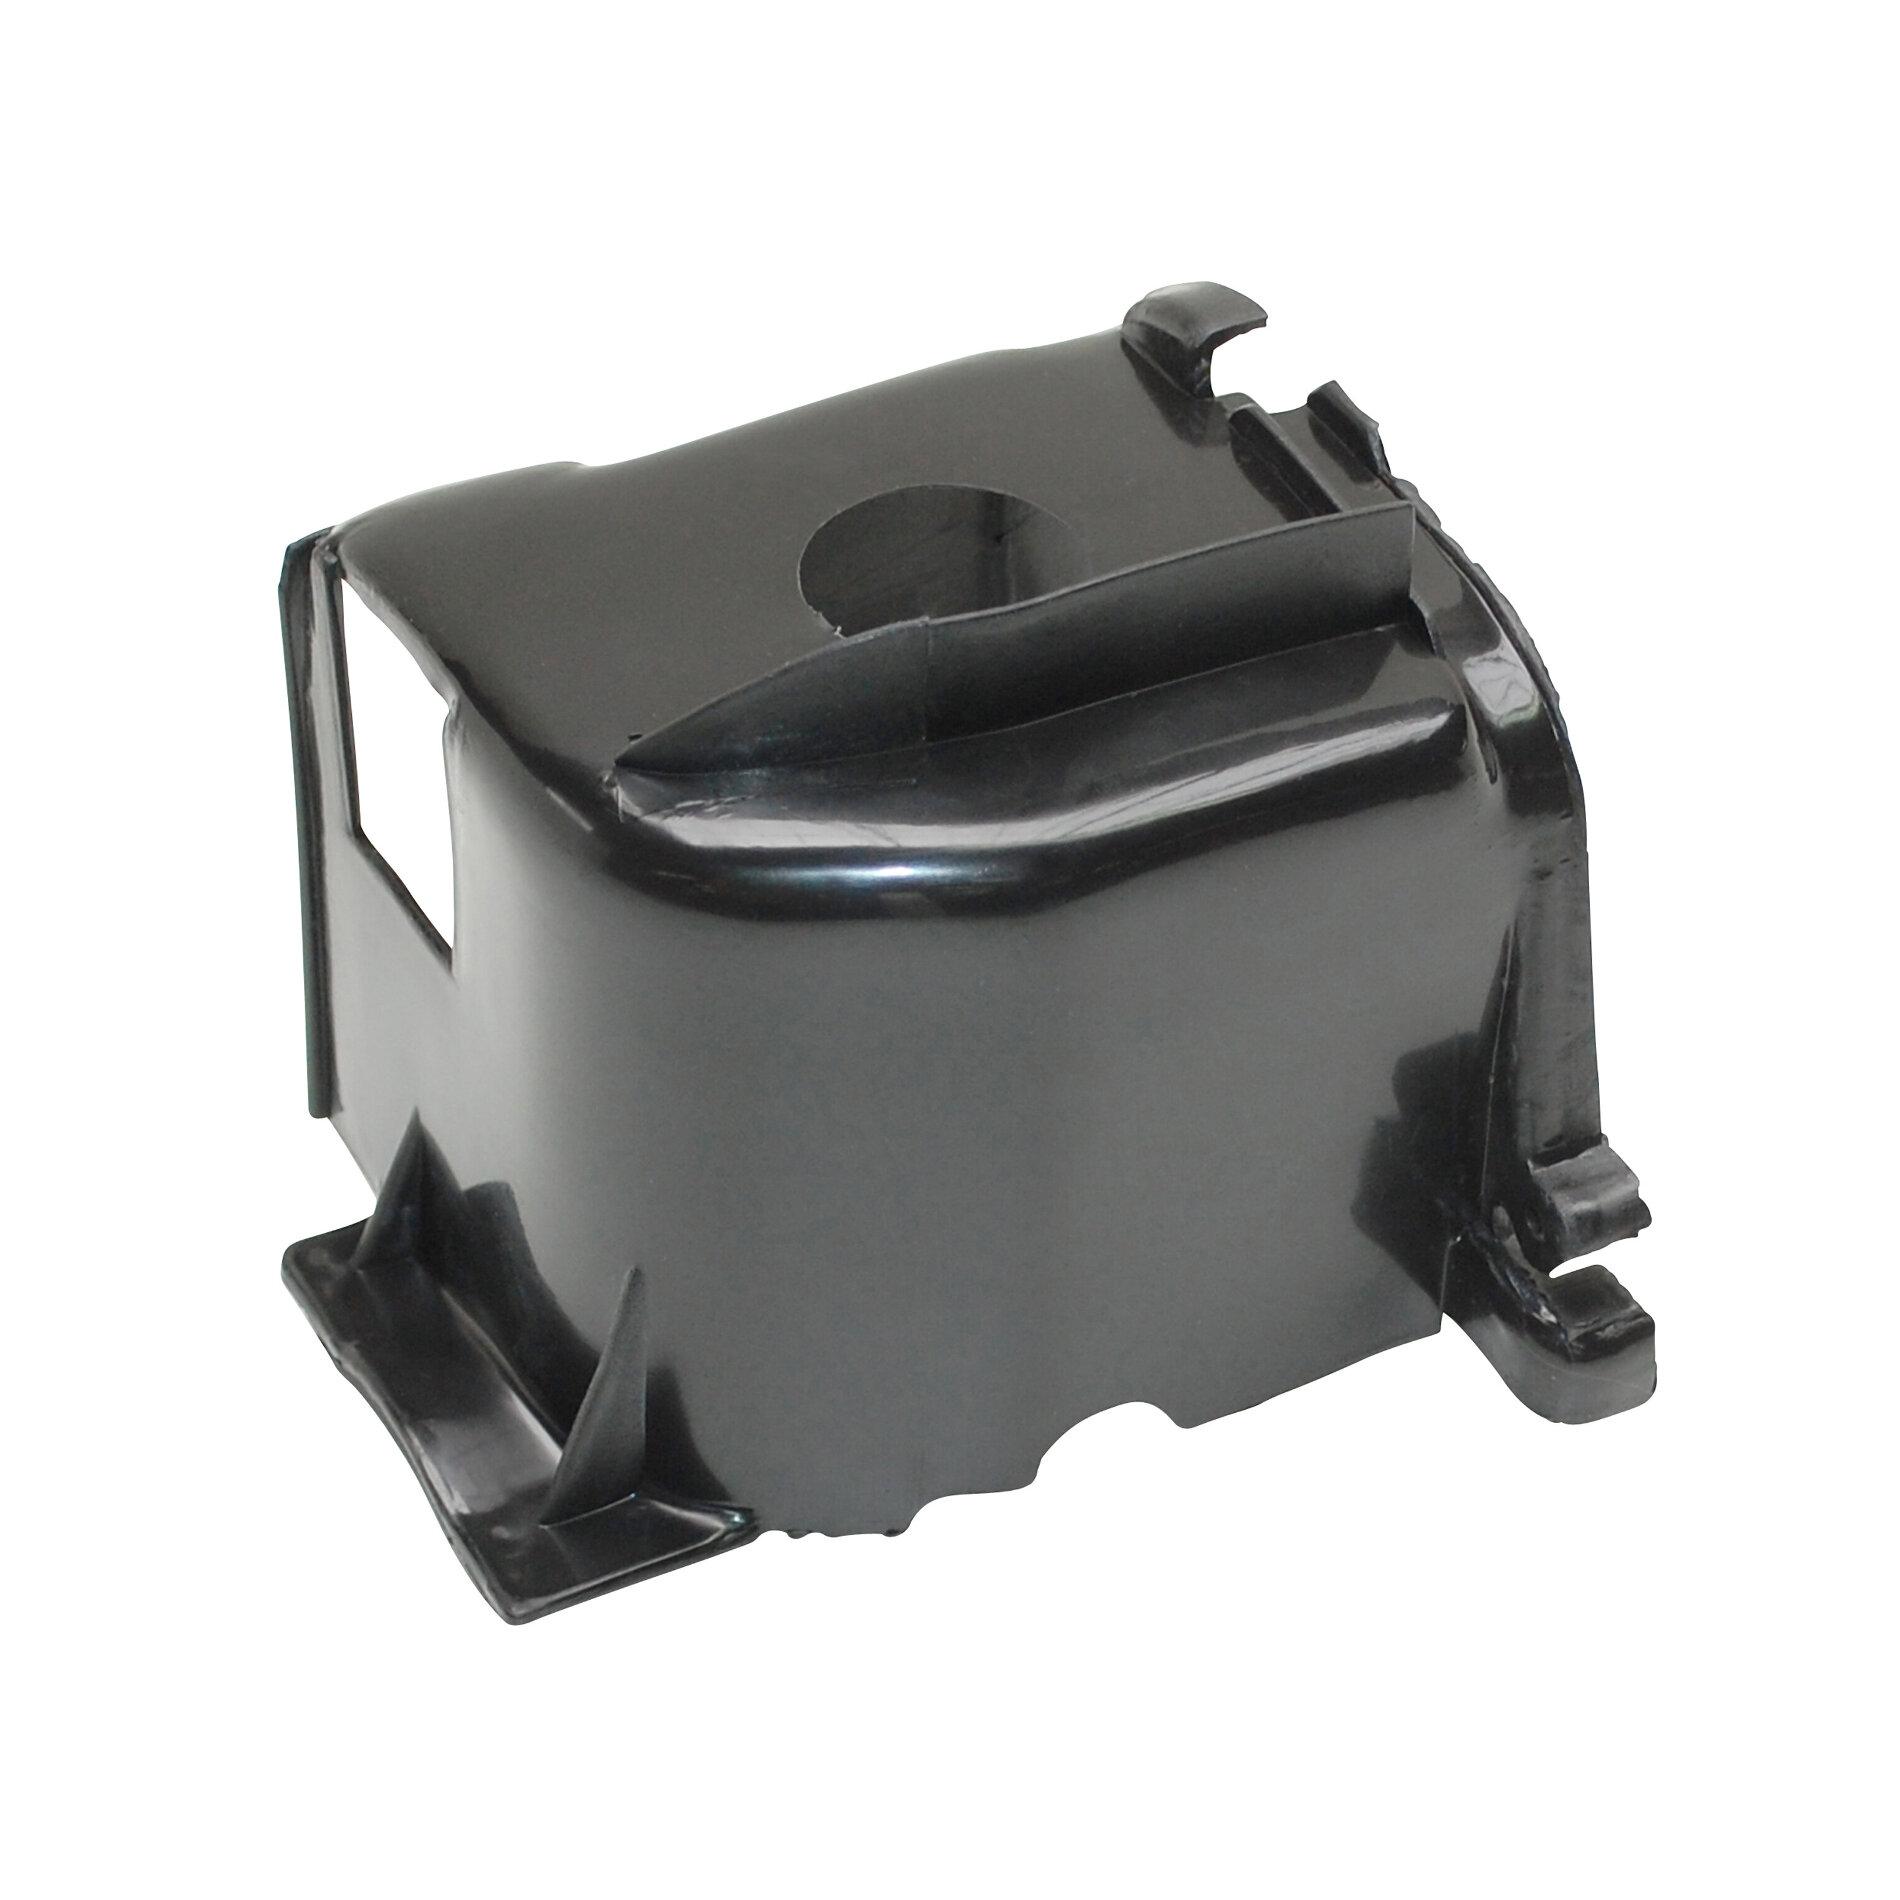 Coiffe de cylindre adaptable MBK 50 Ovetto/Yamaha 50 Neos/Aprilia 50 s